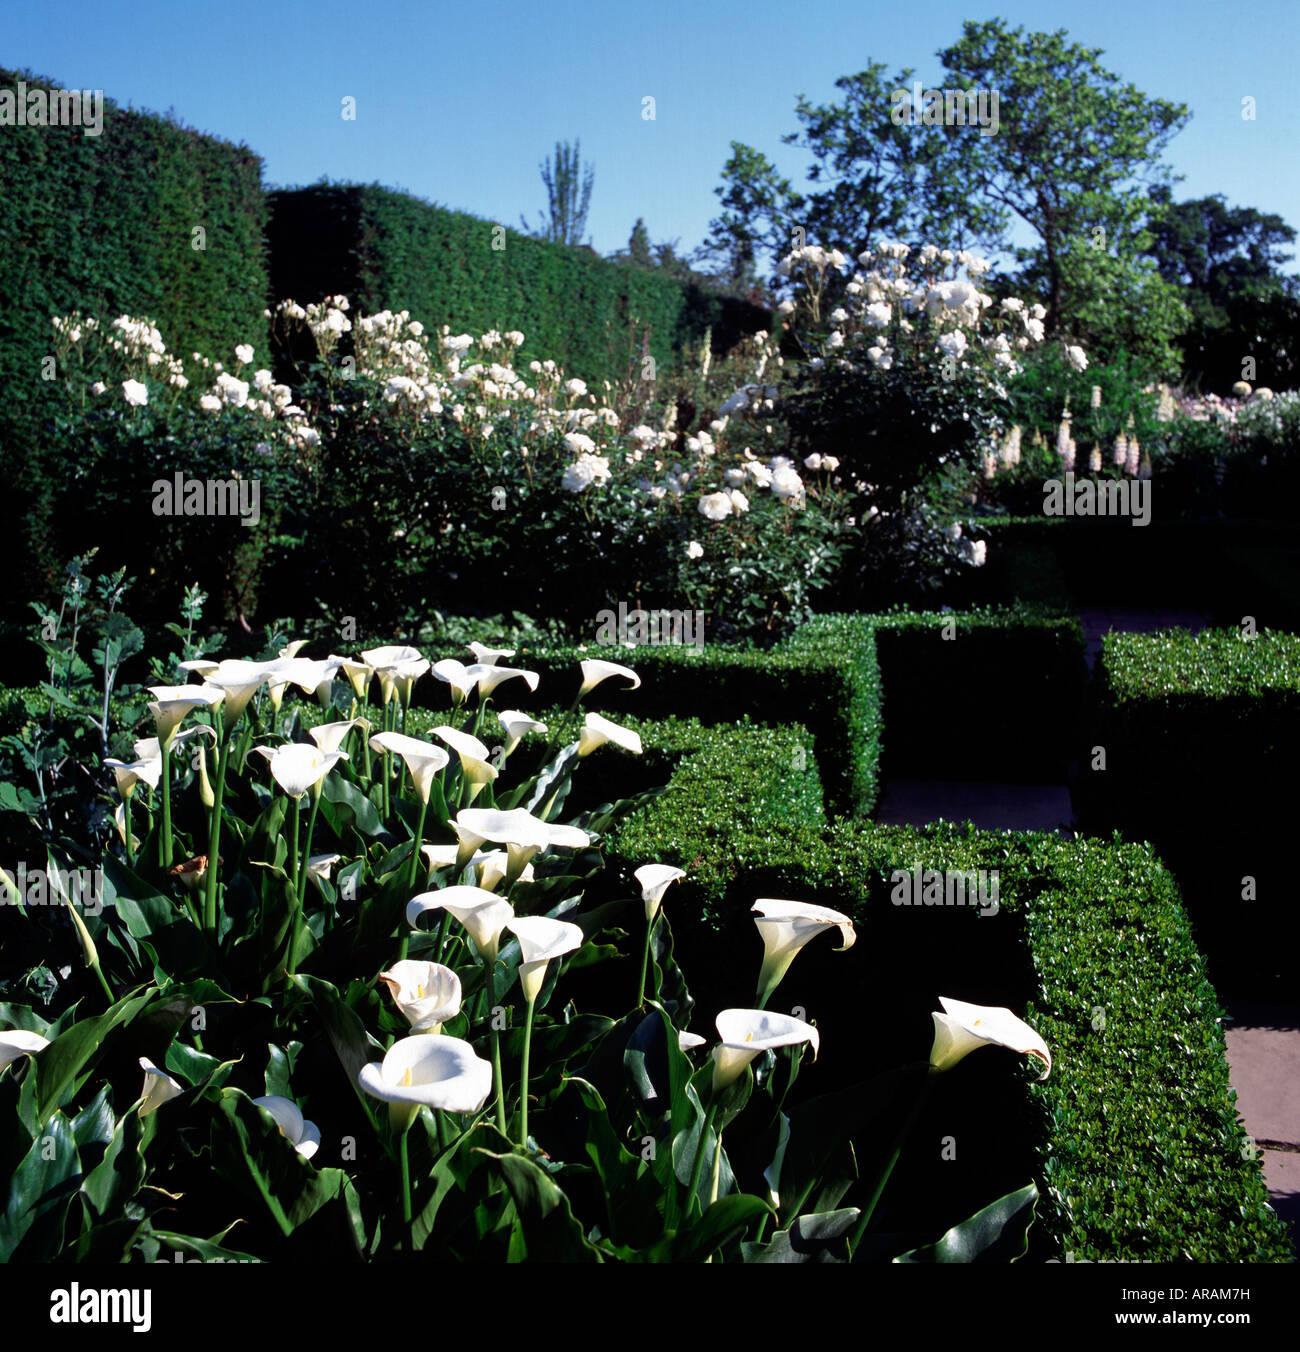 Weißer Garten Sissinghurst sissinghurst place weißer garten stock photo 15994132 alamy